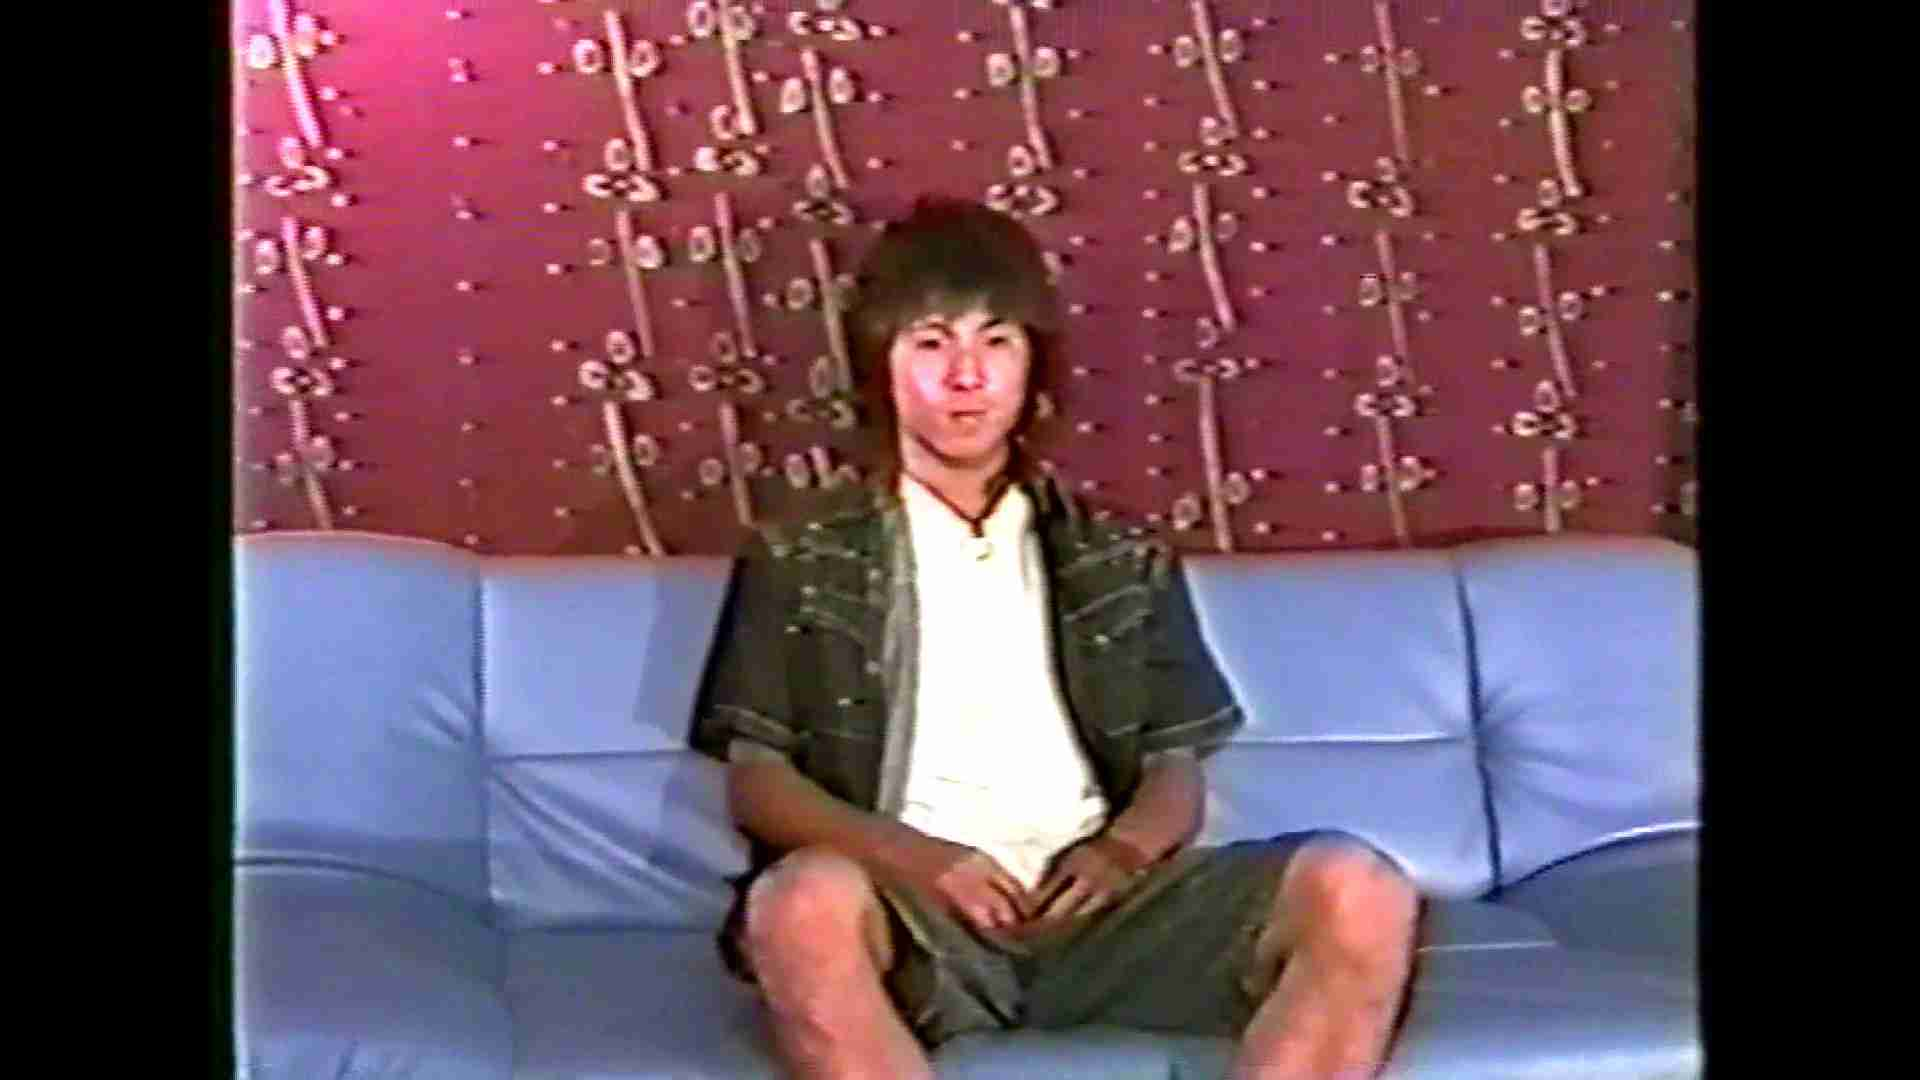 GAYBOY宏のオカズ倉庫Vol.3-1 GAY ゲイセックス画像 103画像 3